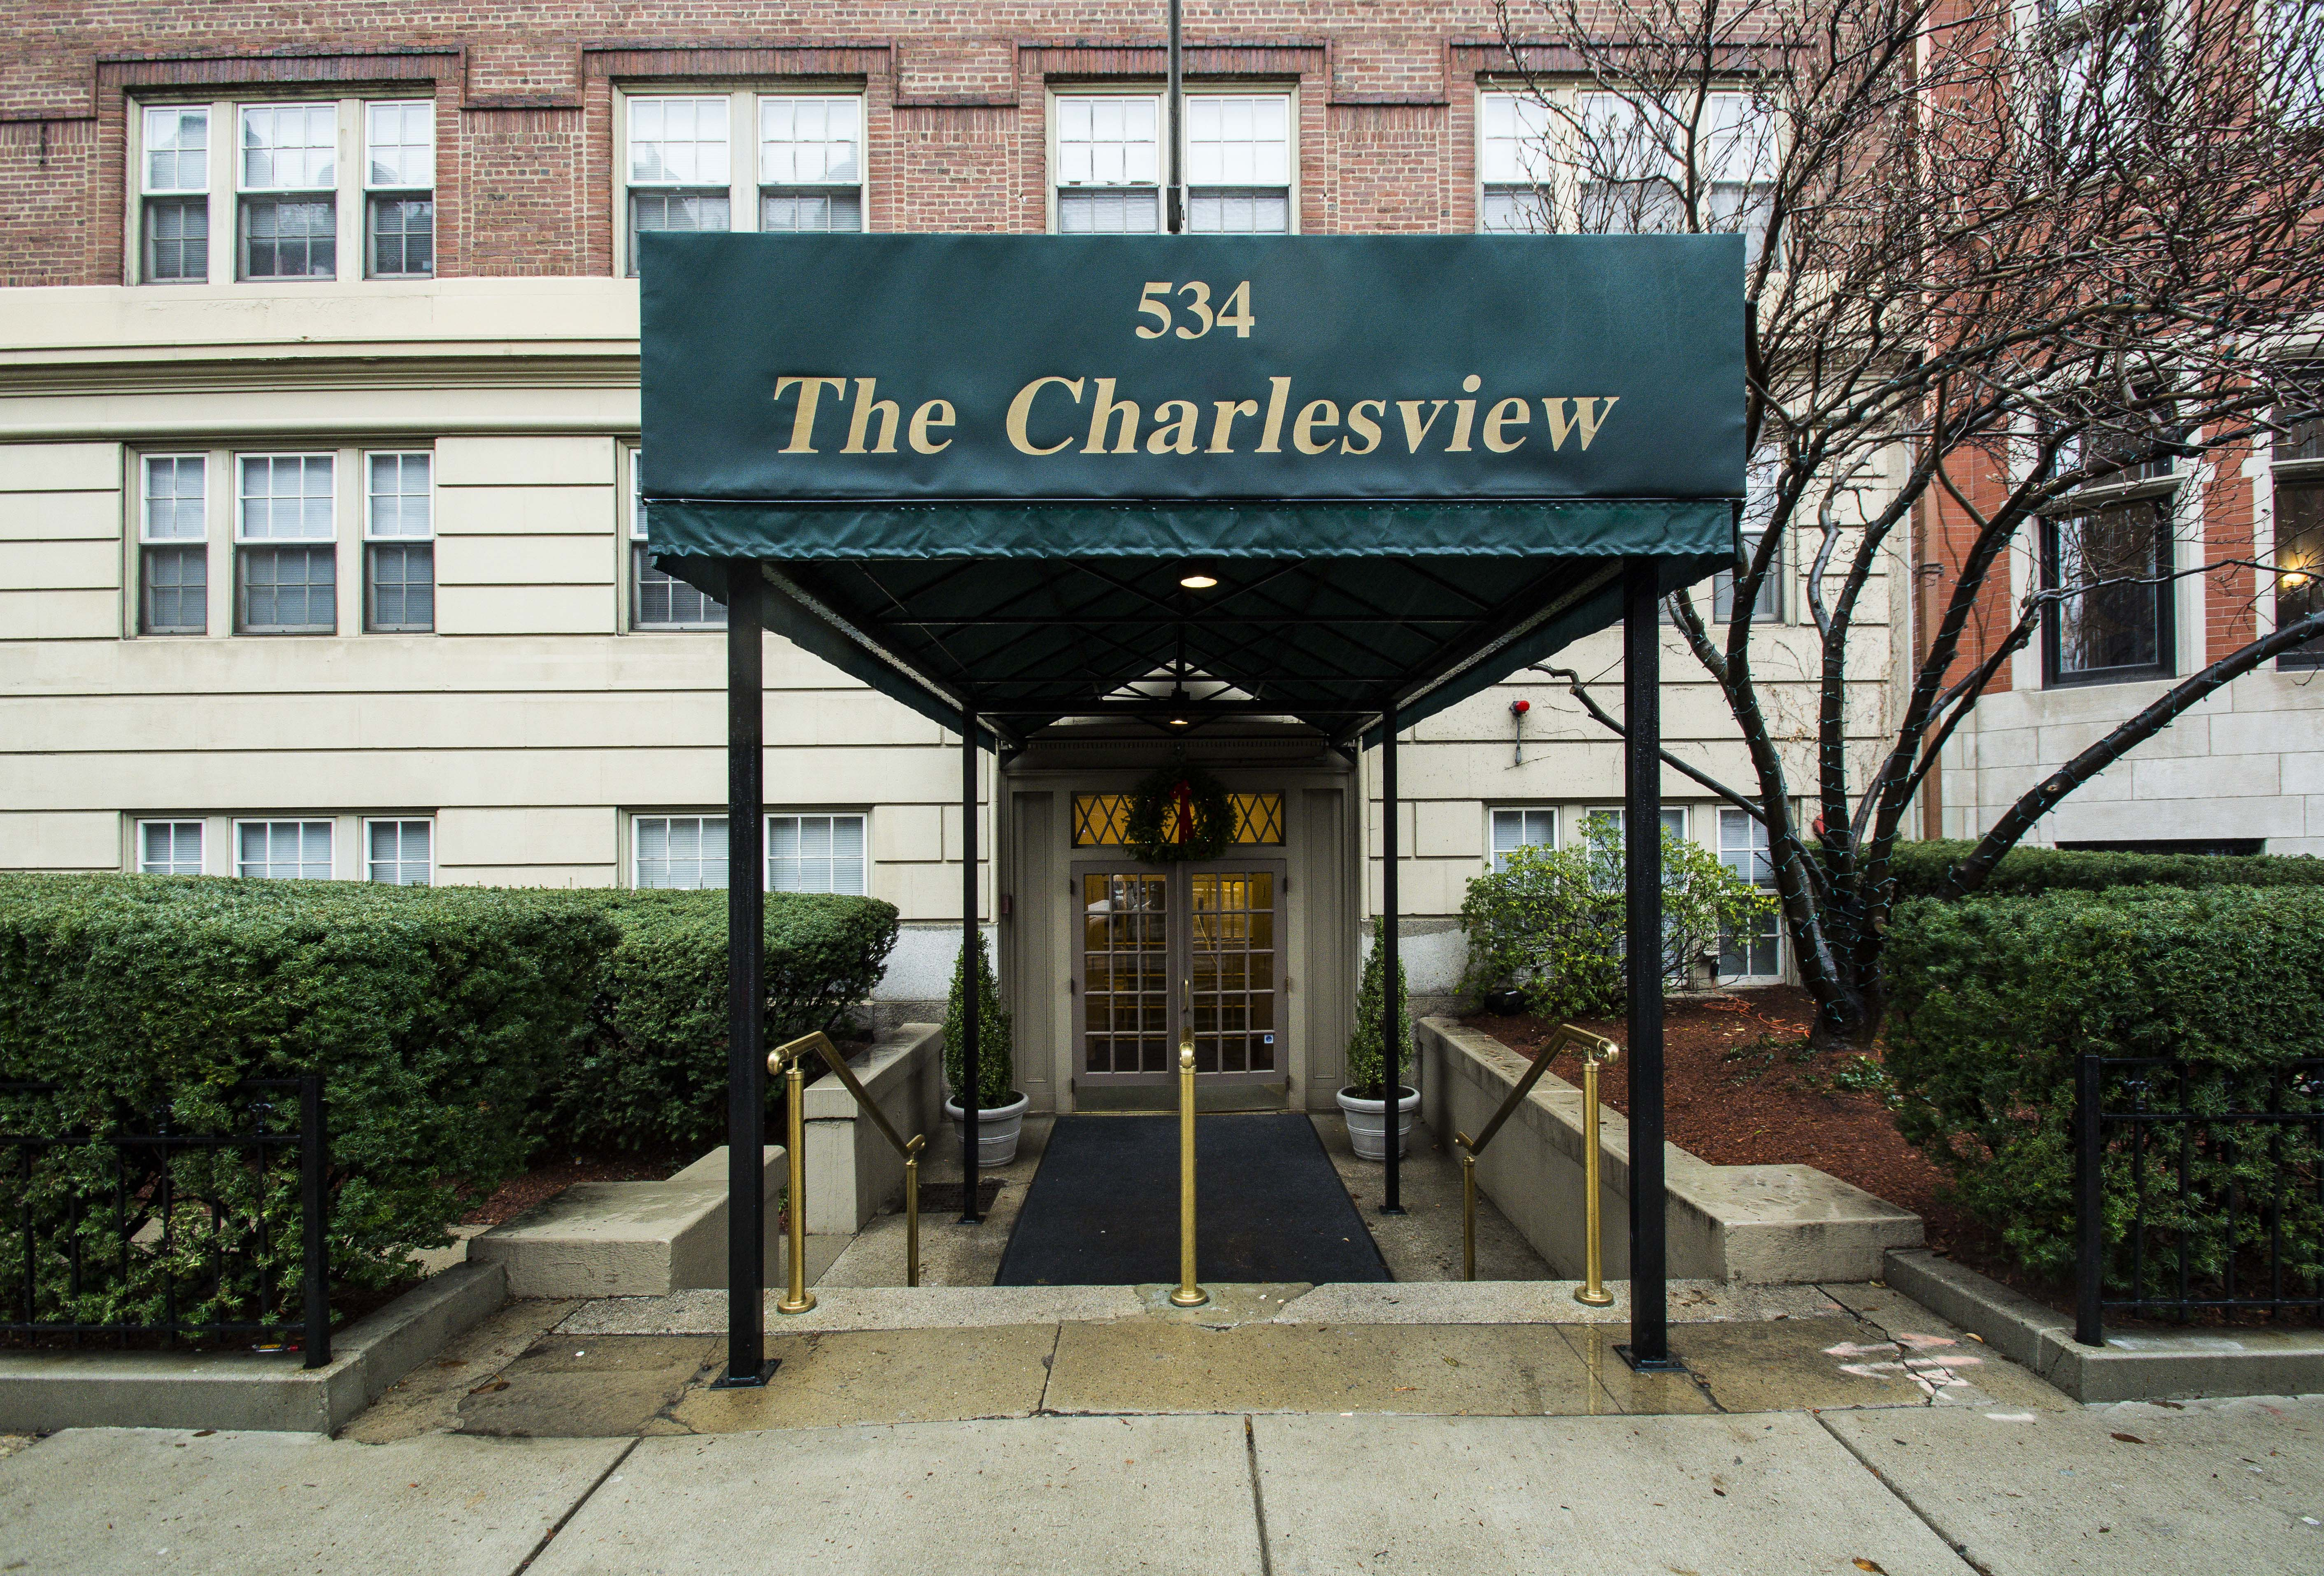 The Charlesview Condominiums